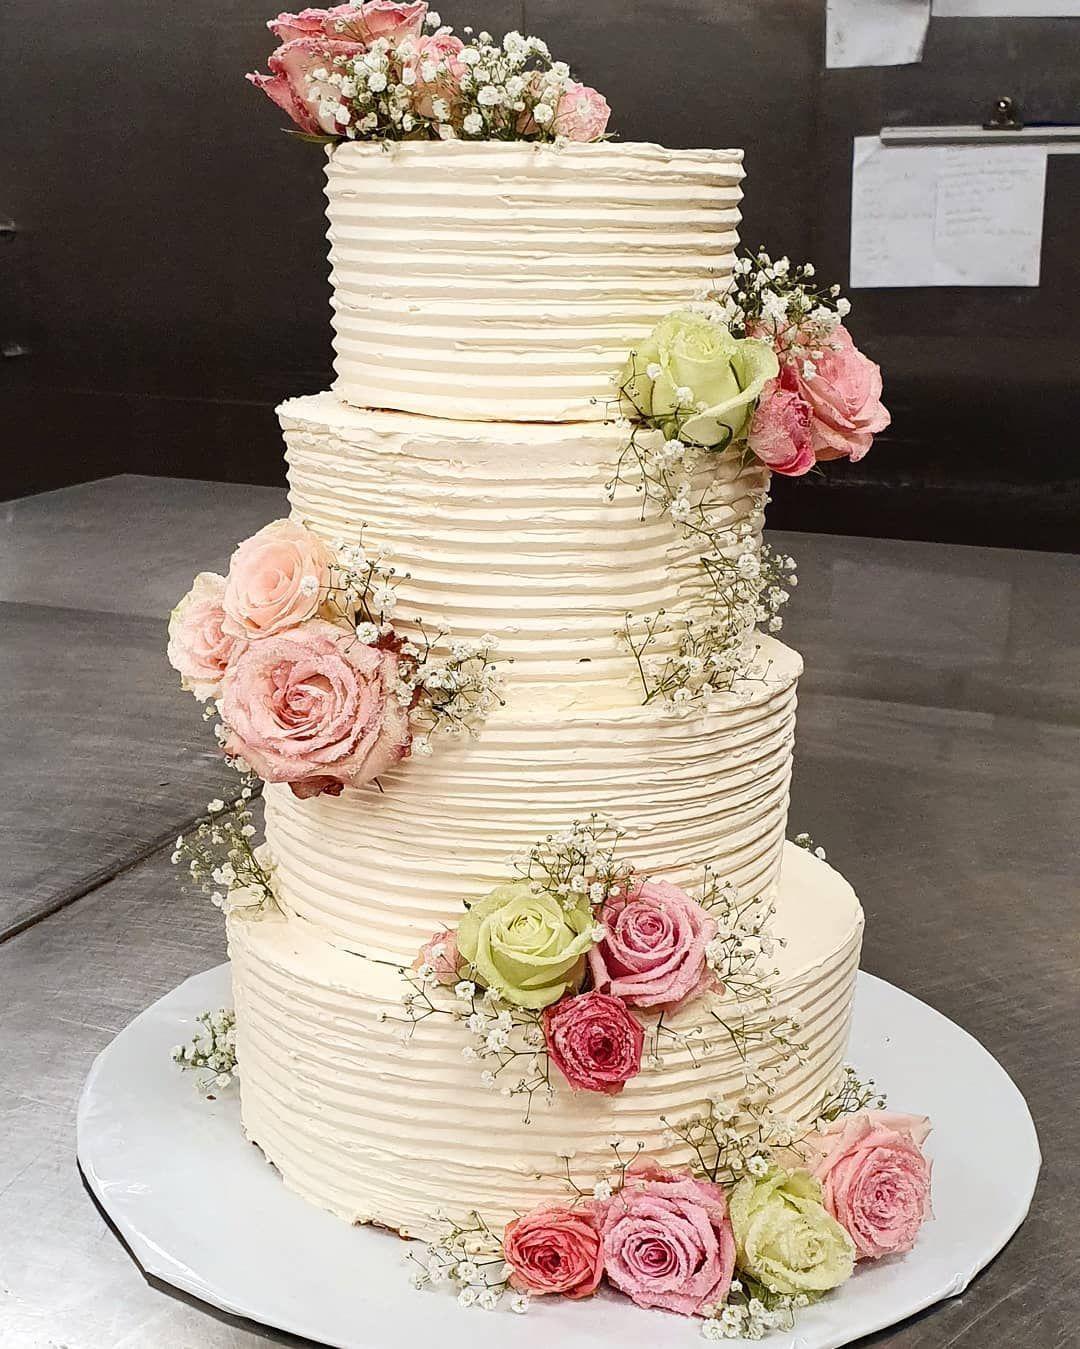 Weddingcake amp;nbsp